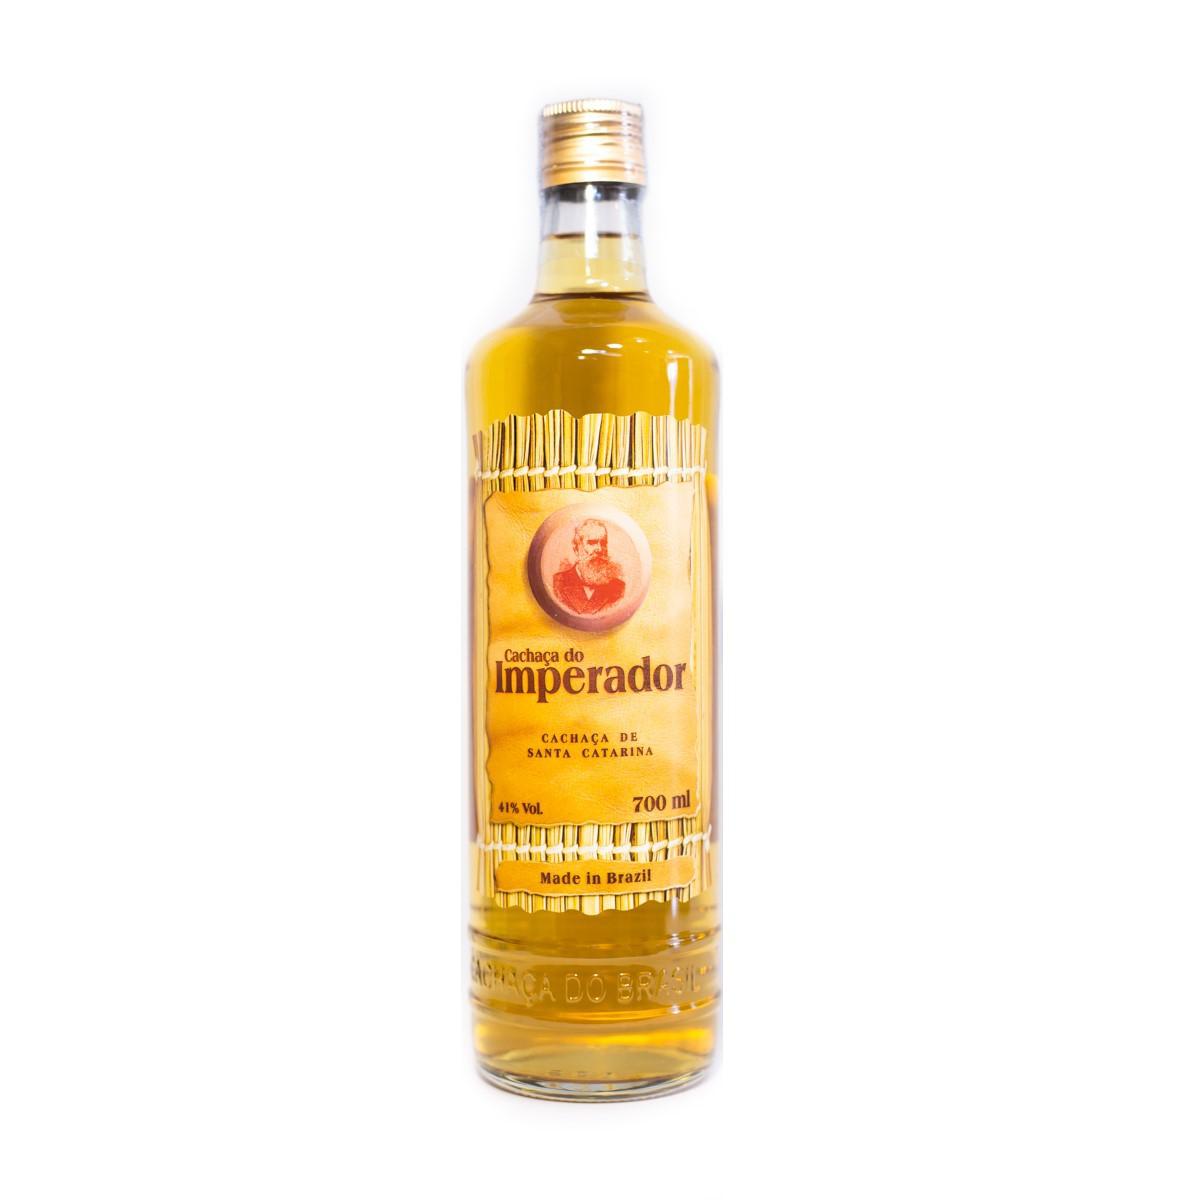 Cachaça Ouro - imperador - 700 ml